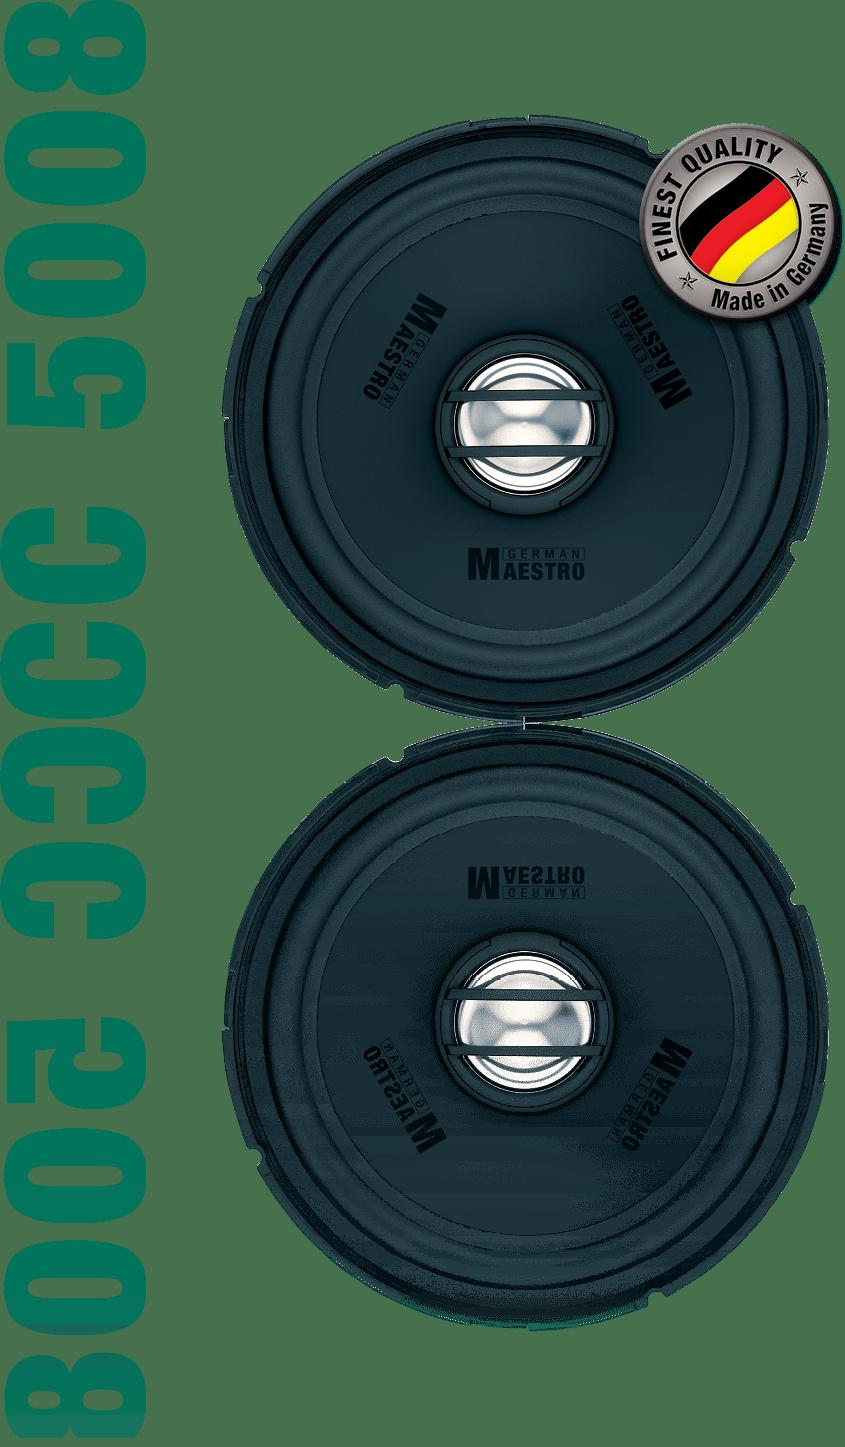 CC 5008 Image